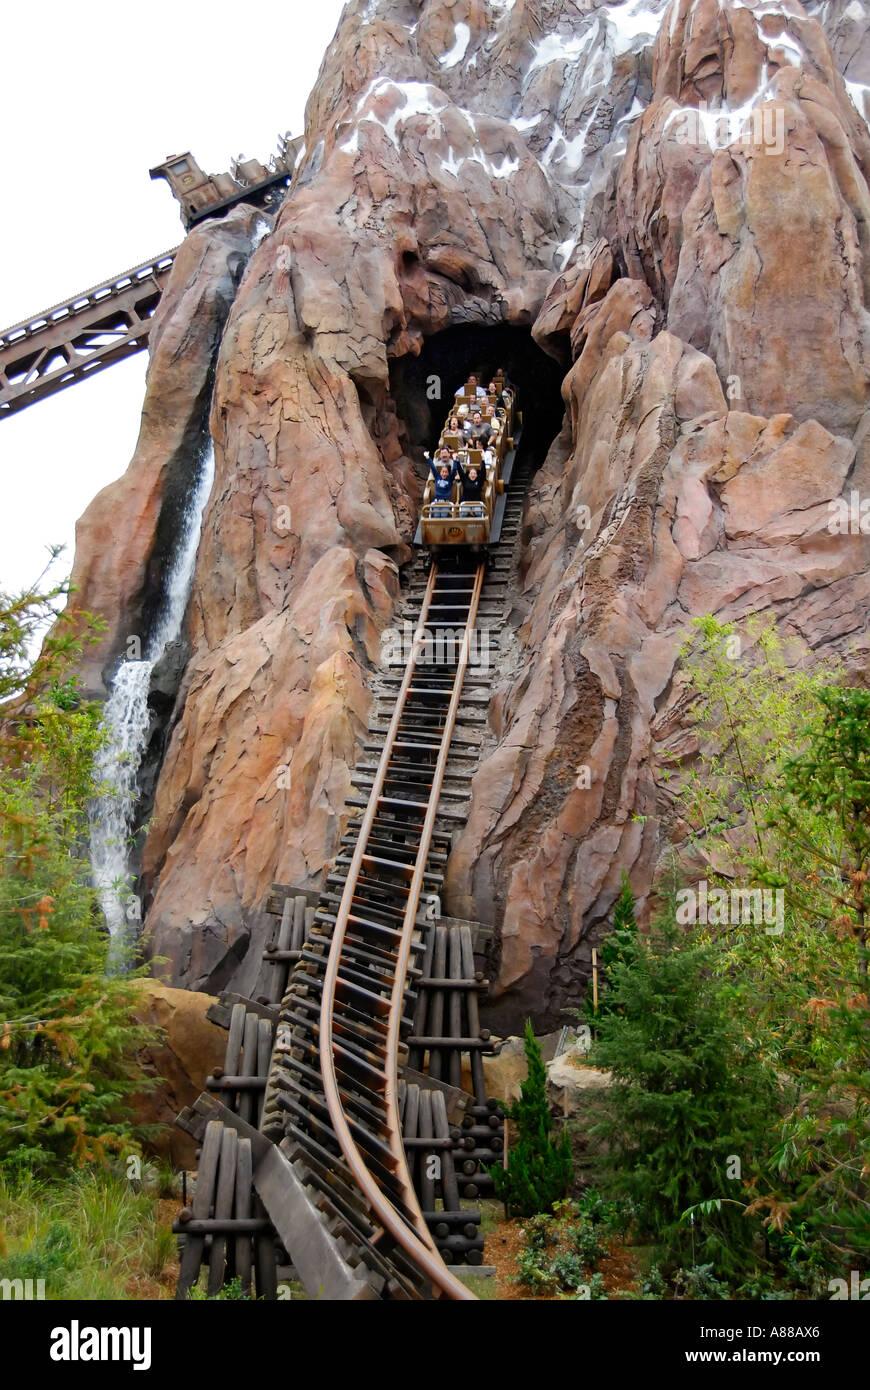 Expedition everest roller coaster at the animal kingdom park at disney world theme park orlando florida fl